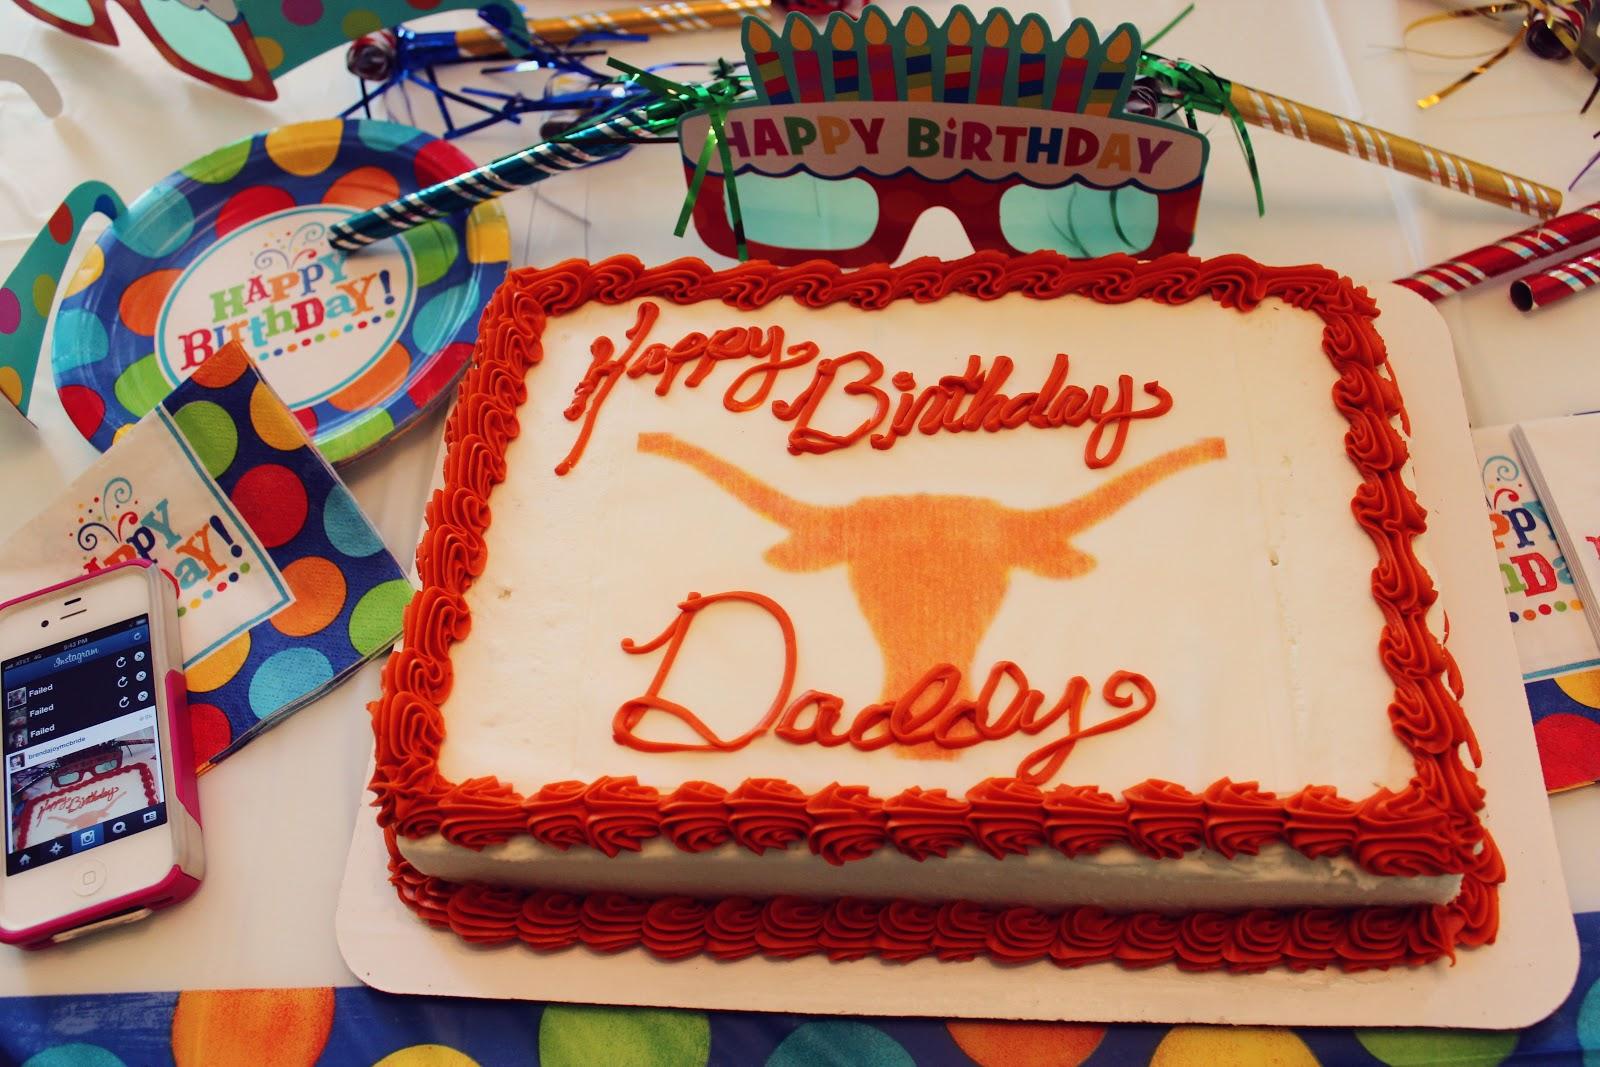 Choosing Joy Today Happy 41st Birthday Daddy